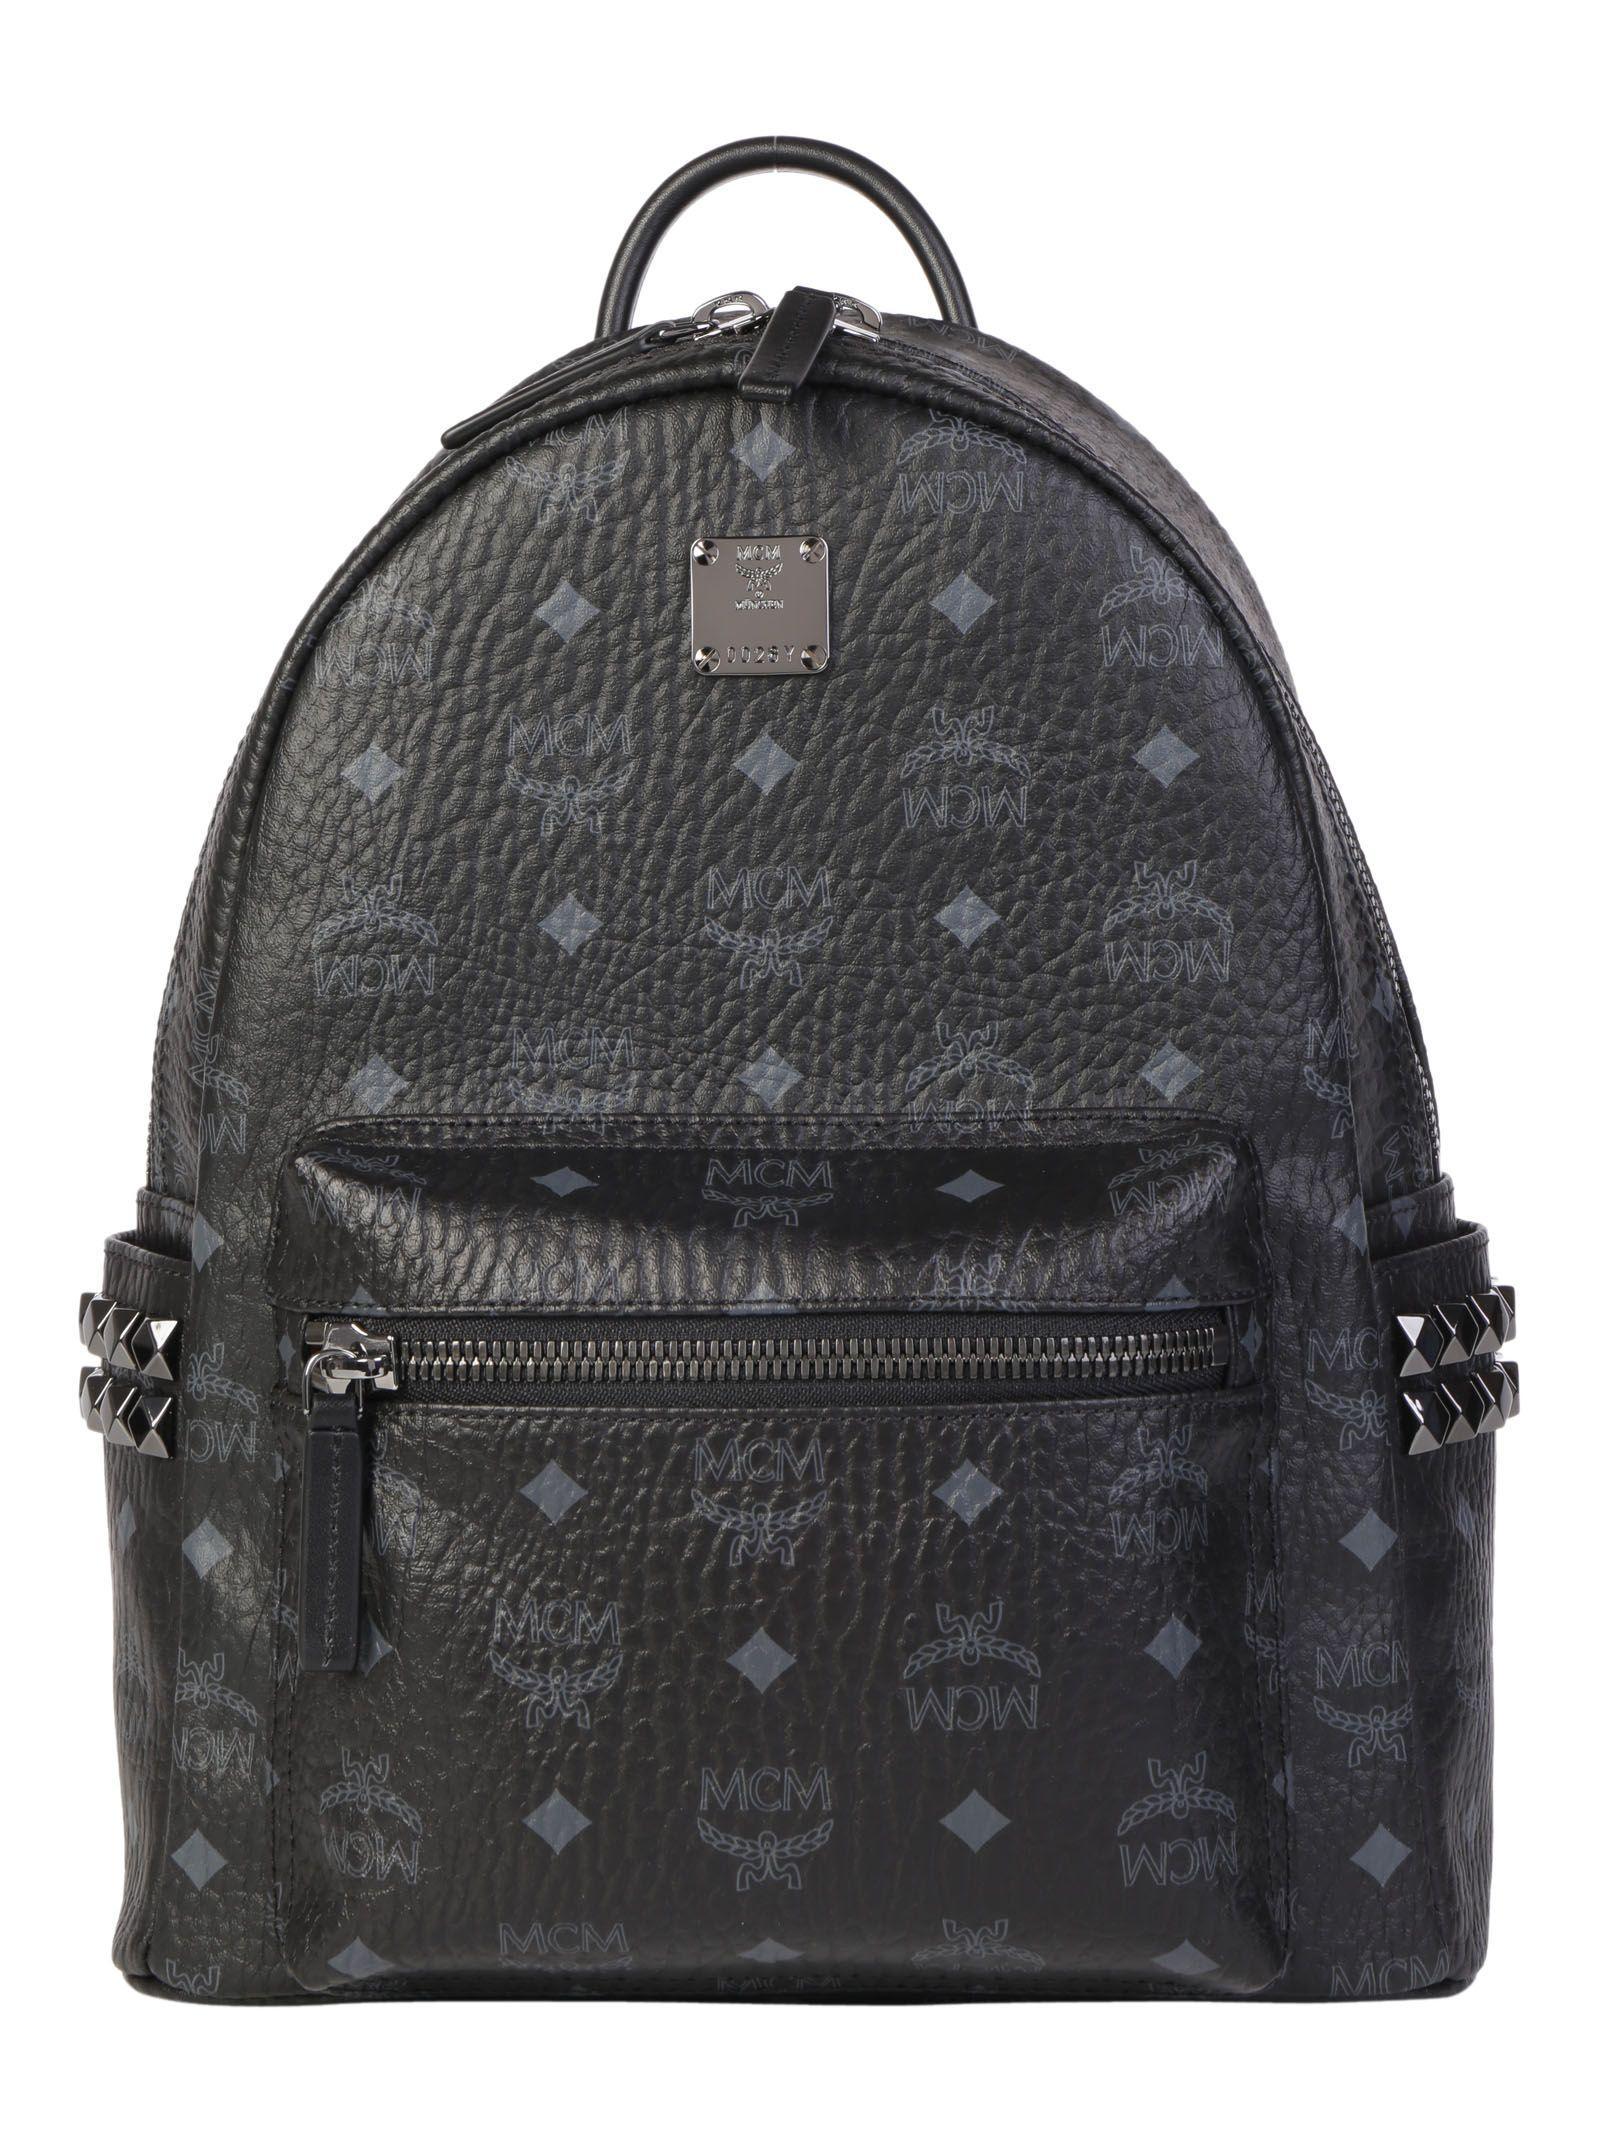 Mcm Start Backpack In Black